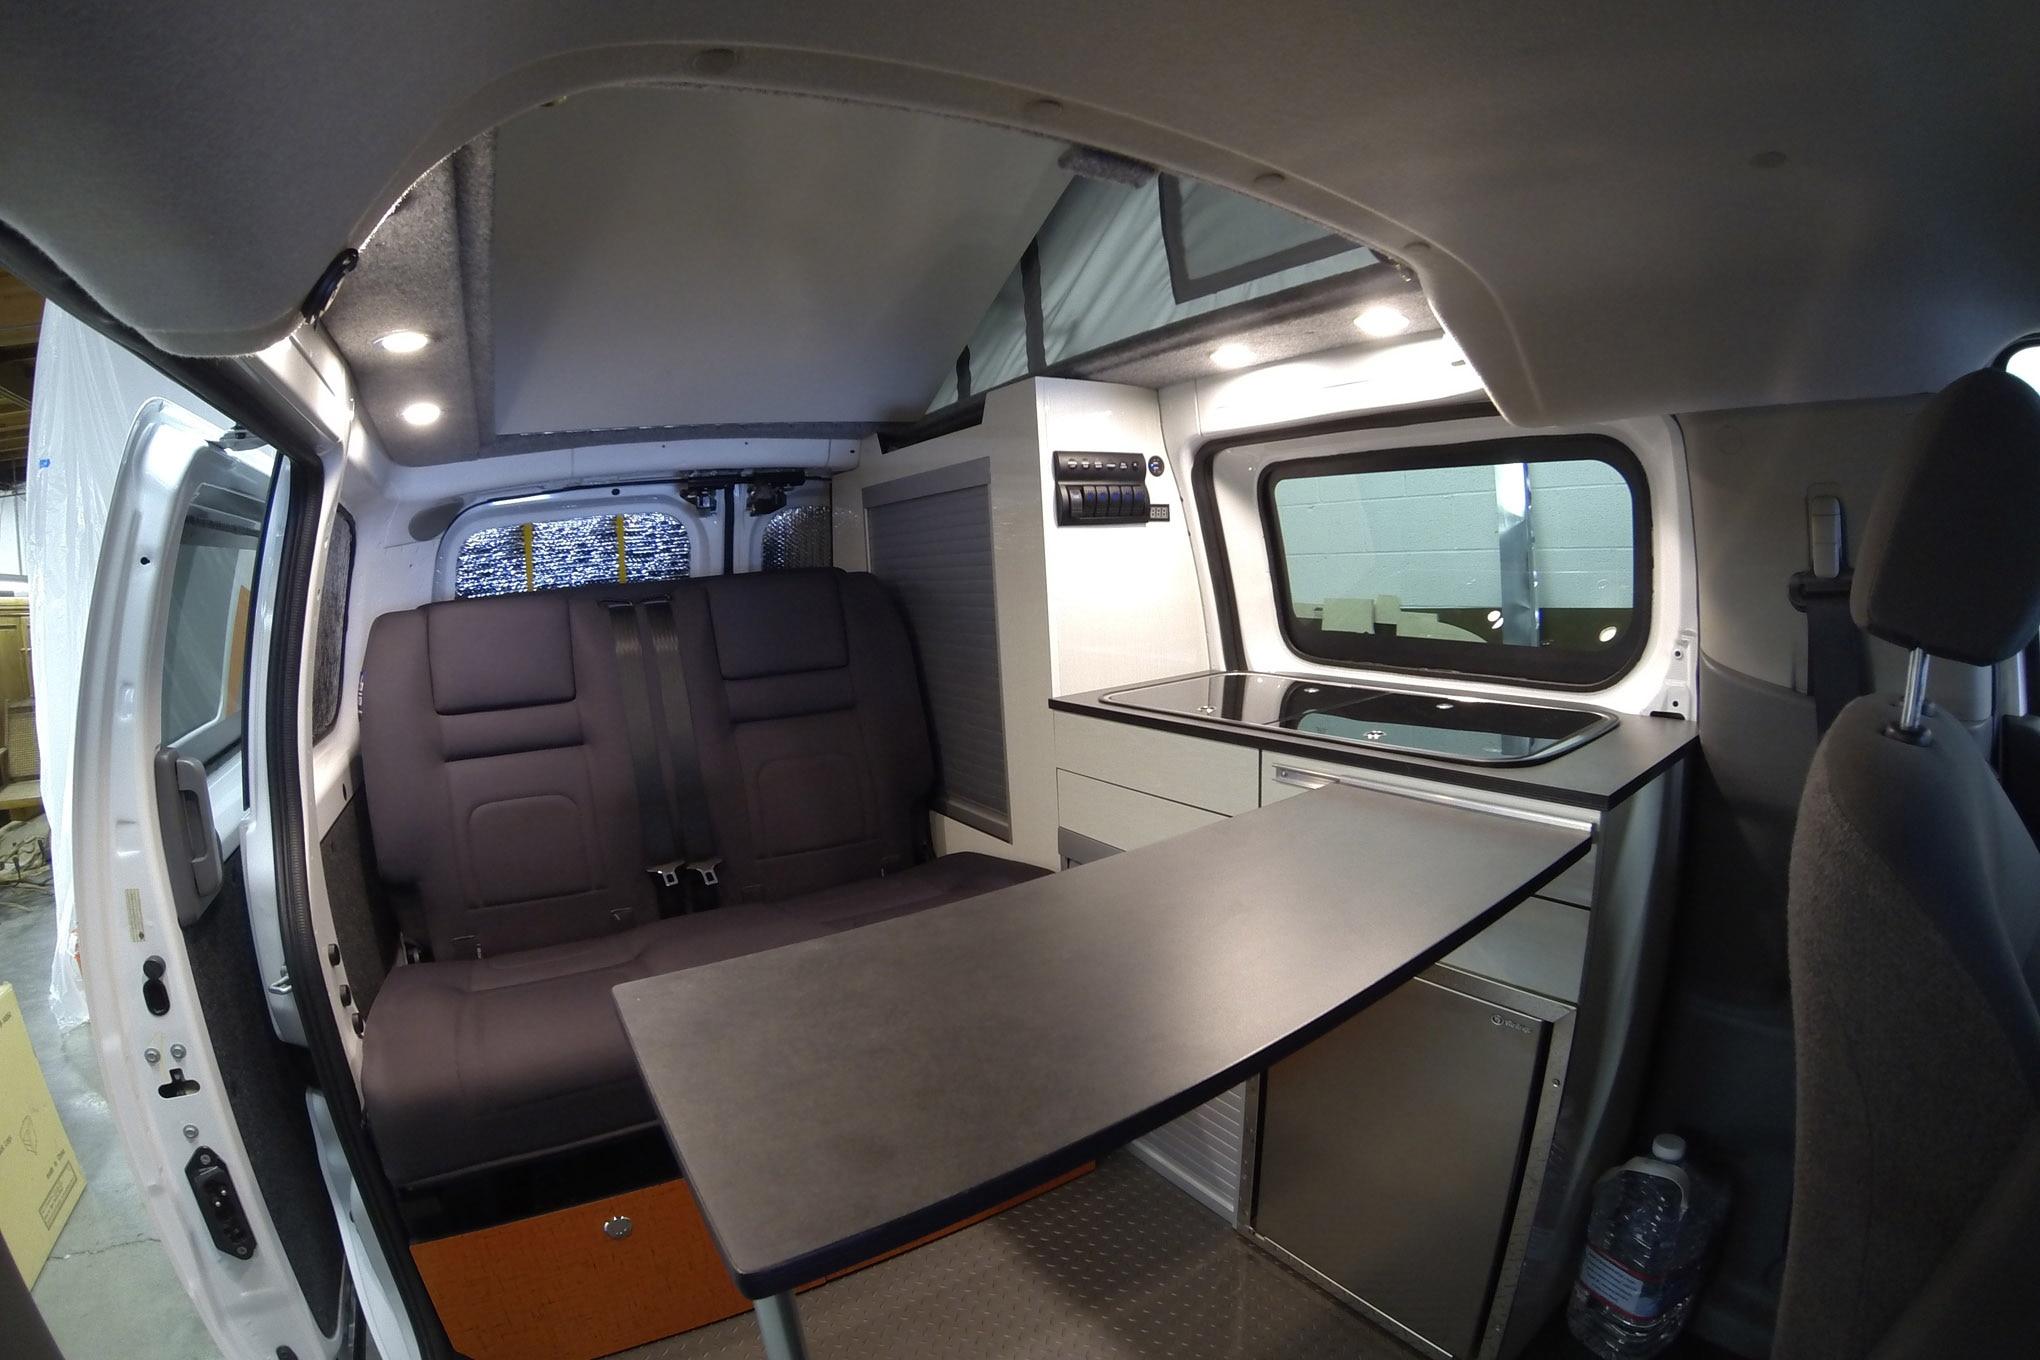 Nissan NV200 Recon Camper Van Review